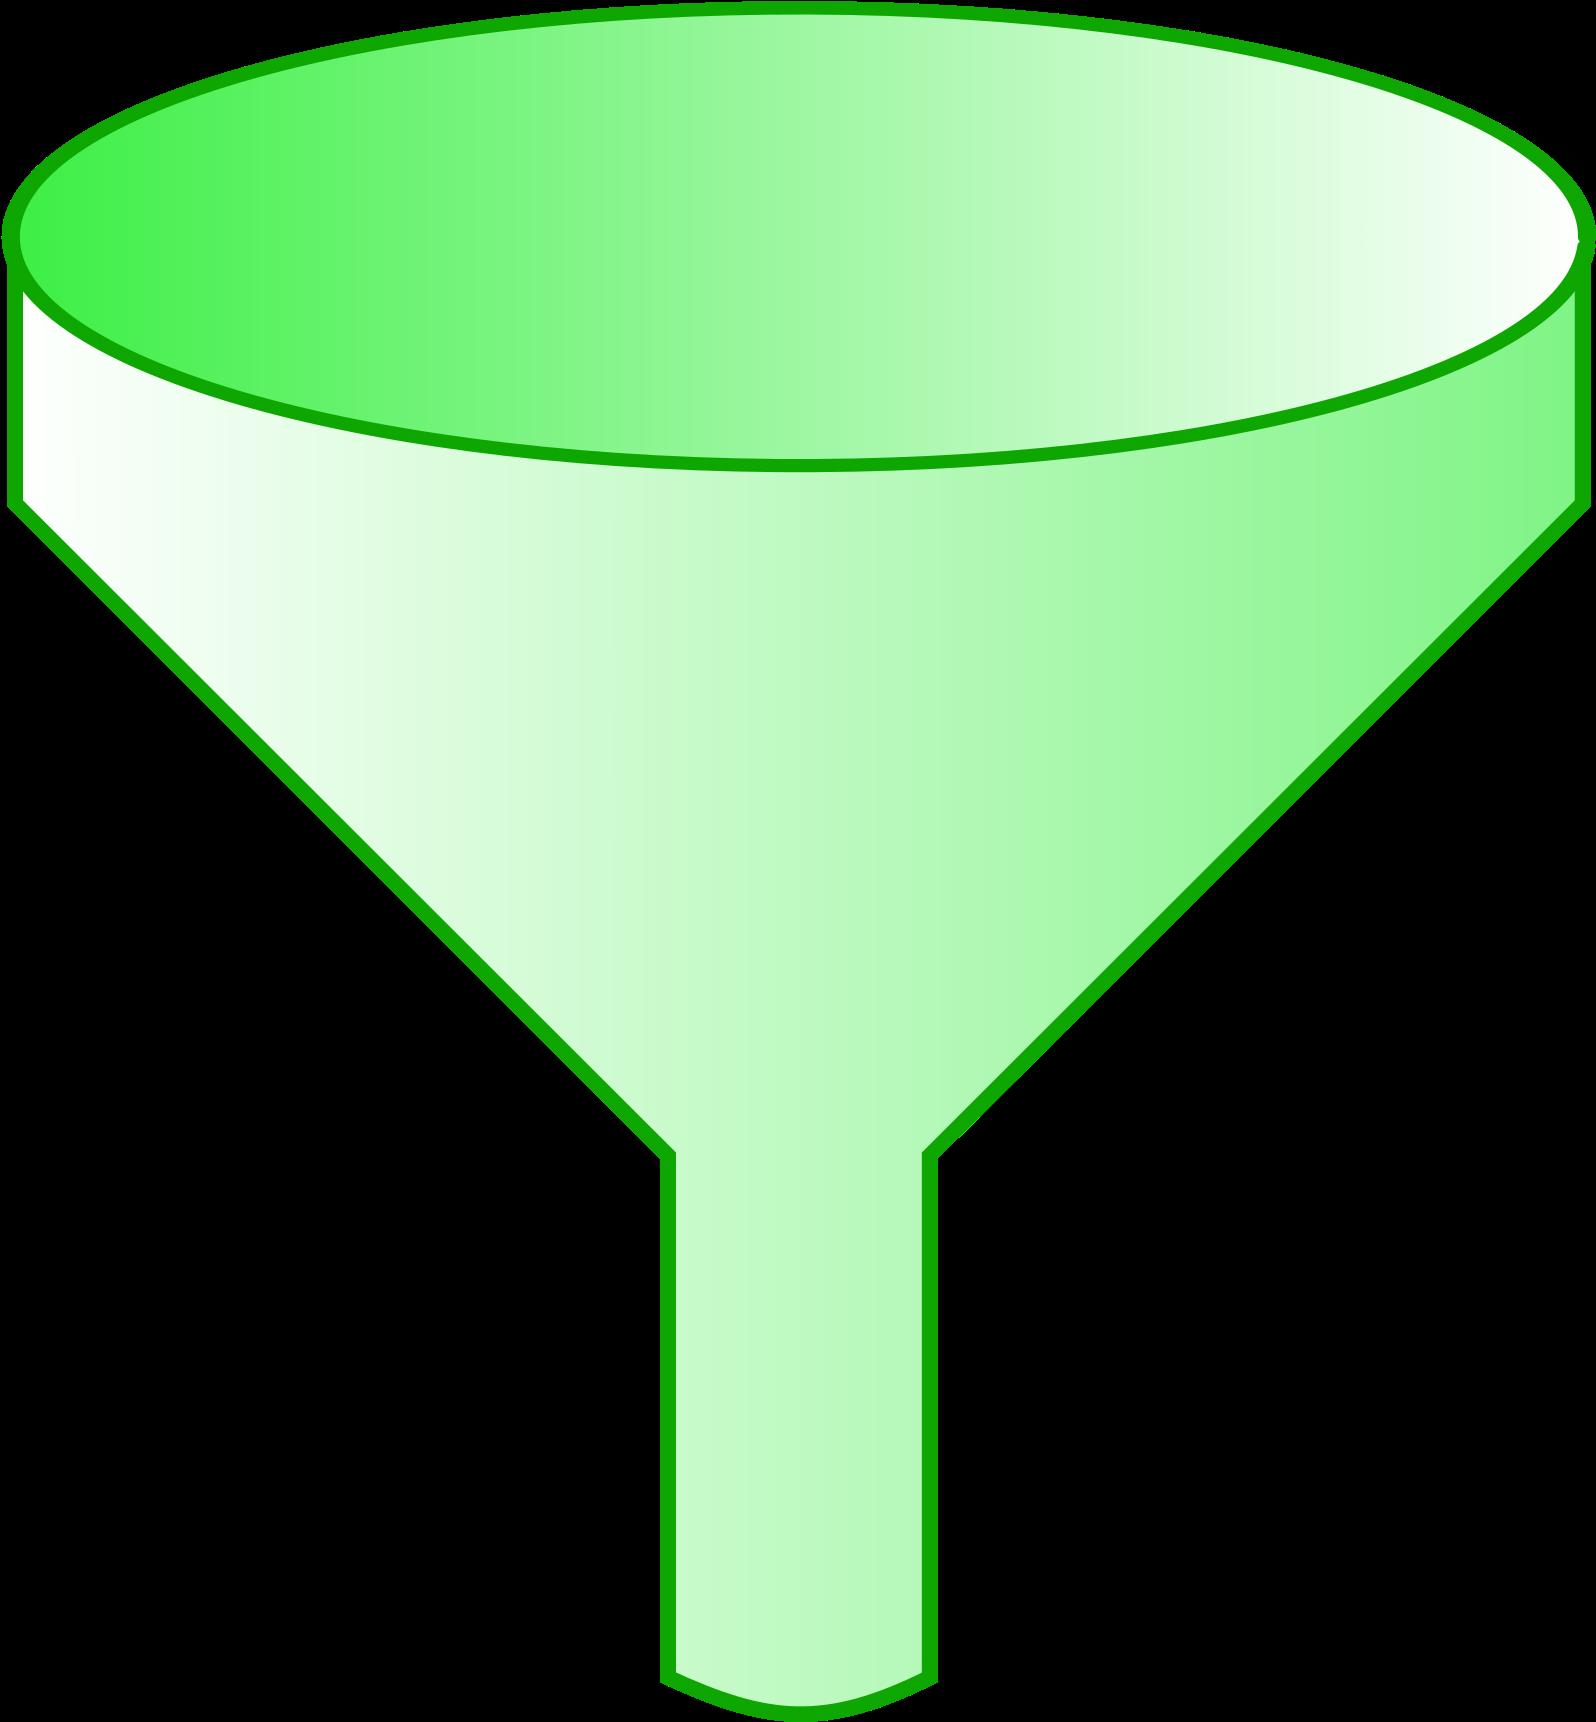 Funnel Clipart - Clip Art (1700x2400)